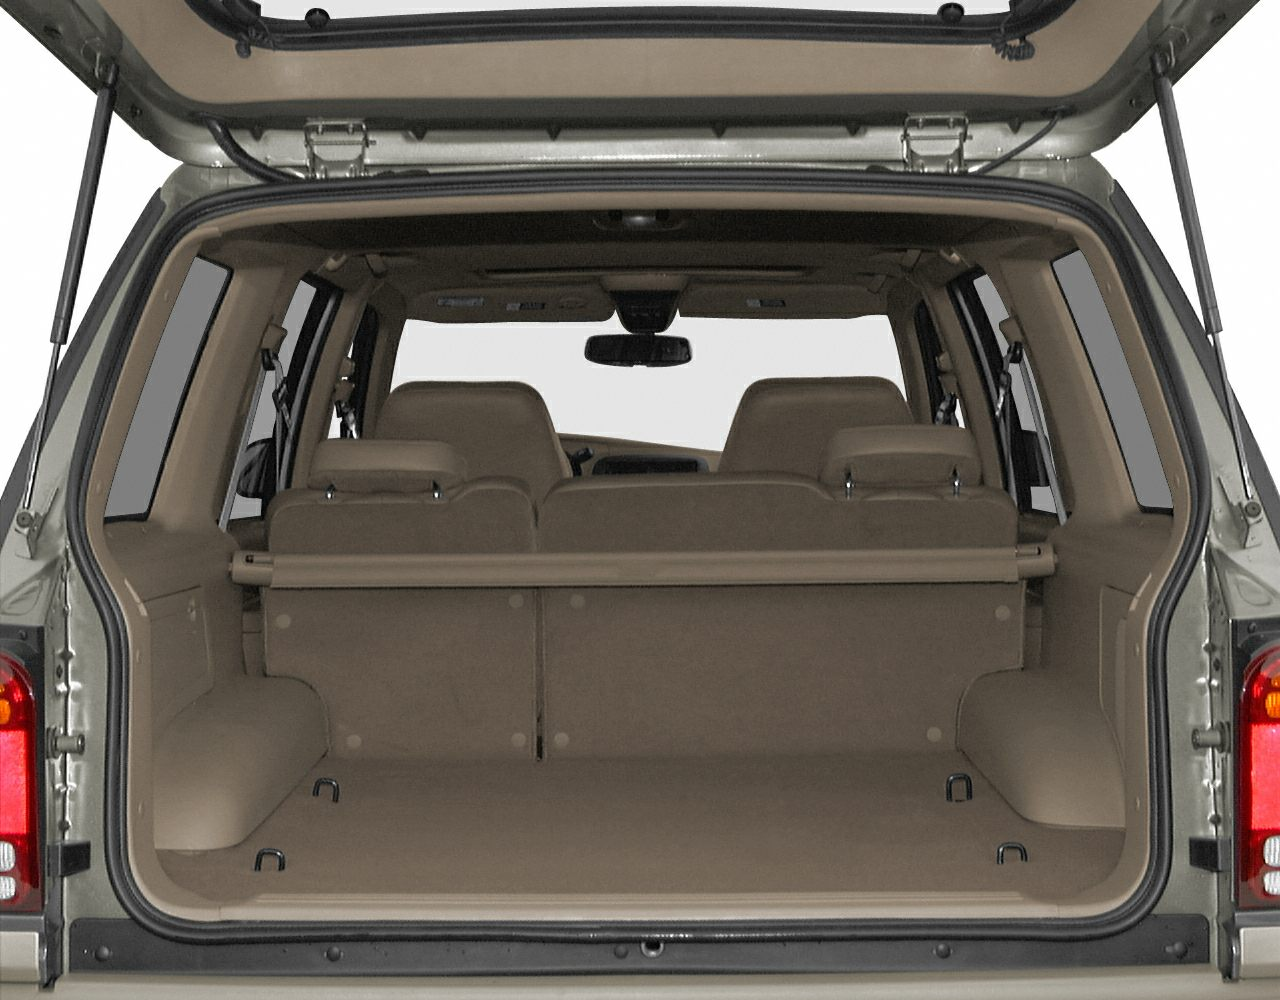 2000 ford explorer eddie bauer 4dr 4x4 pictures 2000 ford explorer interior parts